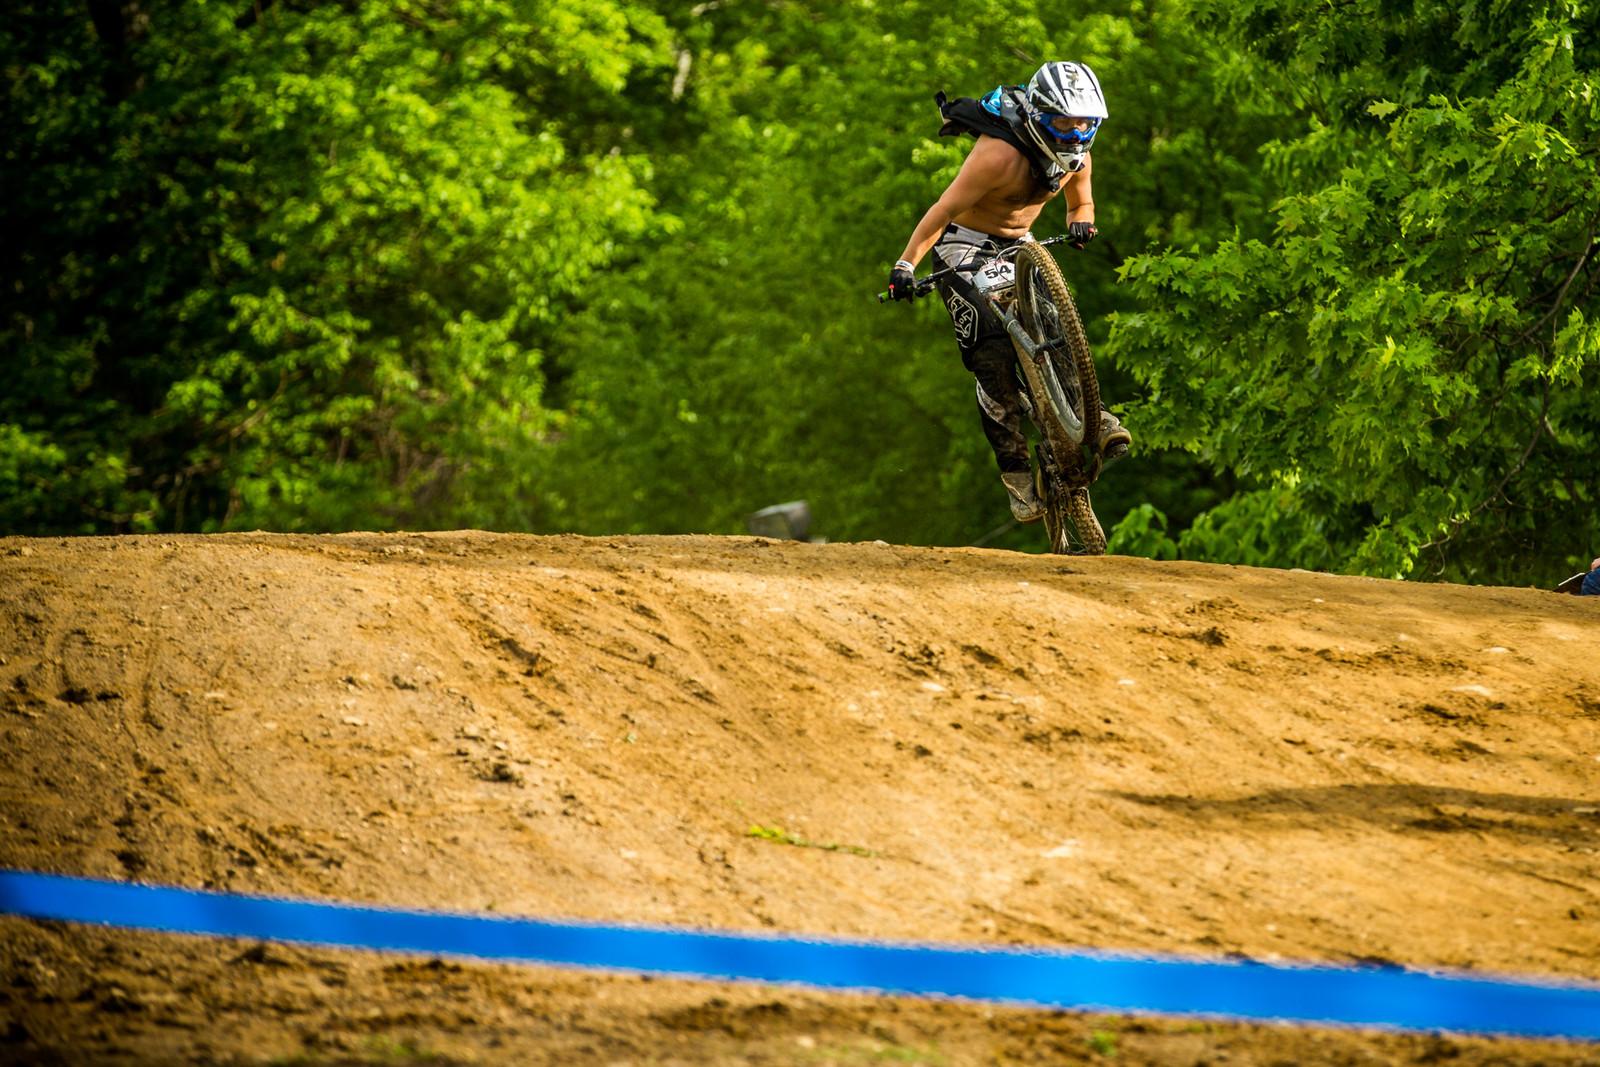 Tyler Puisello - US Open Whip Off! - Mountain Biking Pictures - Vital MTB